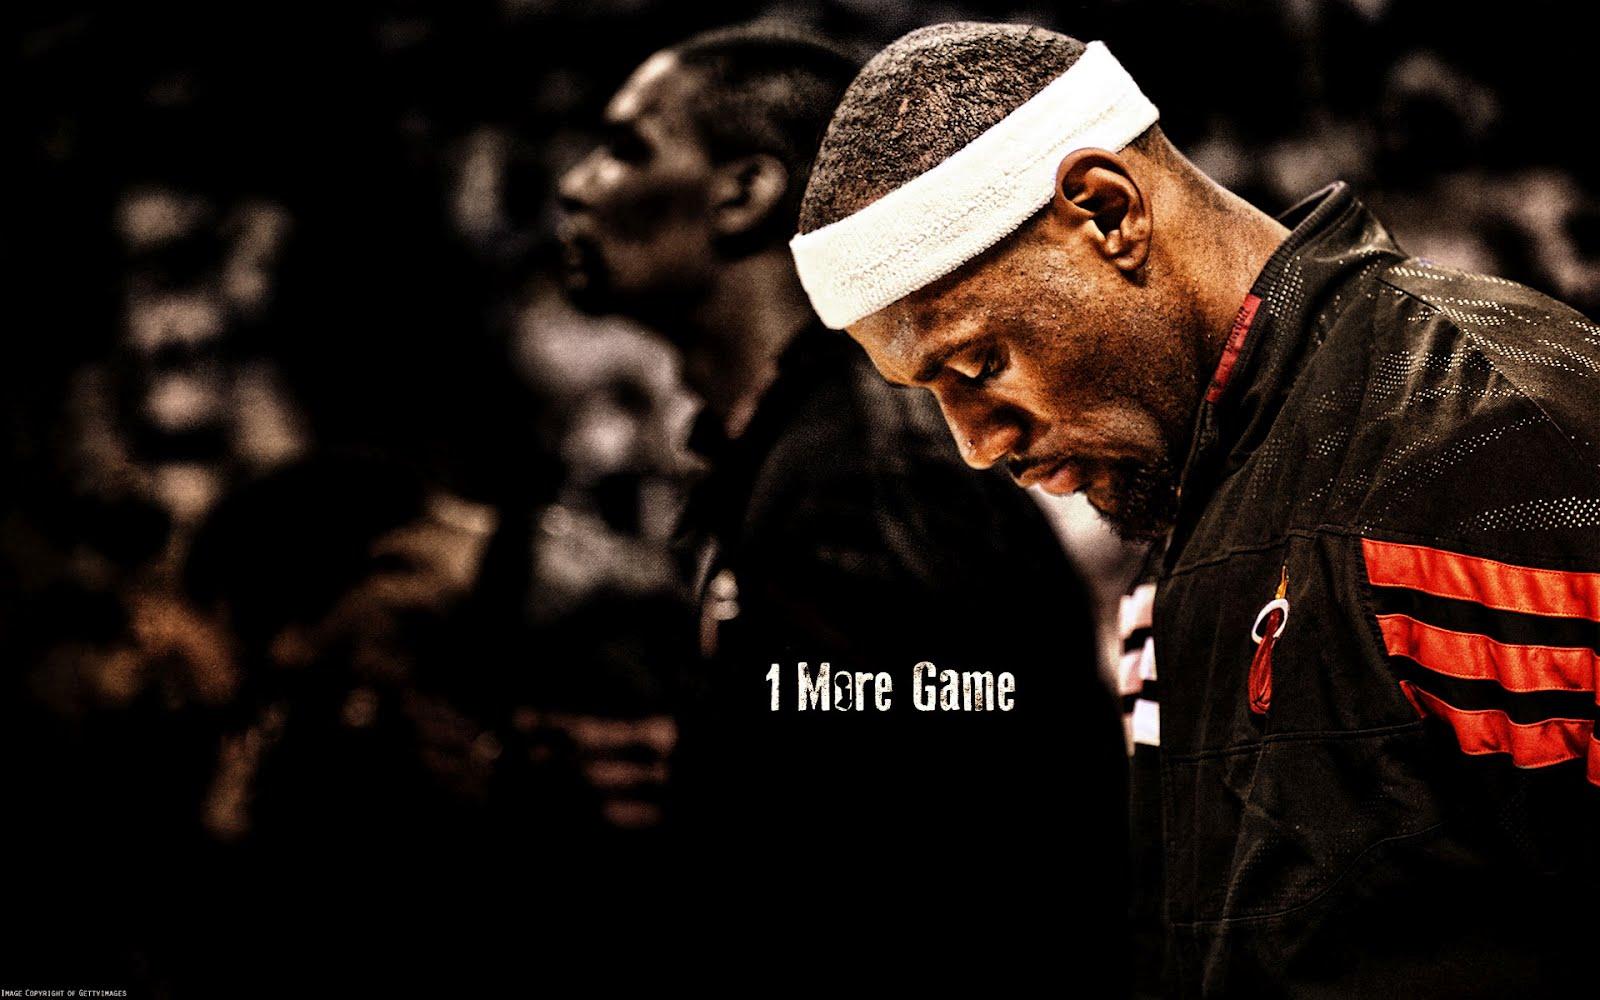 LeBron James 1 More Game 1920x1200 Wallpaper Big Fan of NBA   Daily 1600x1000